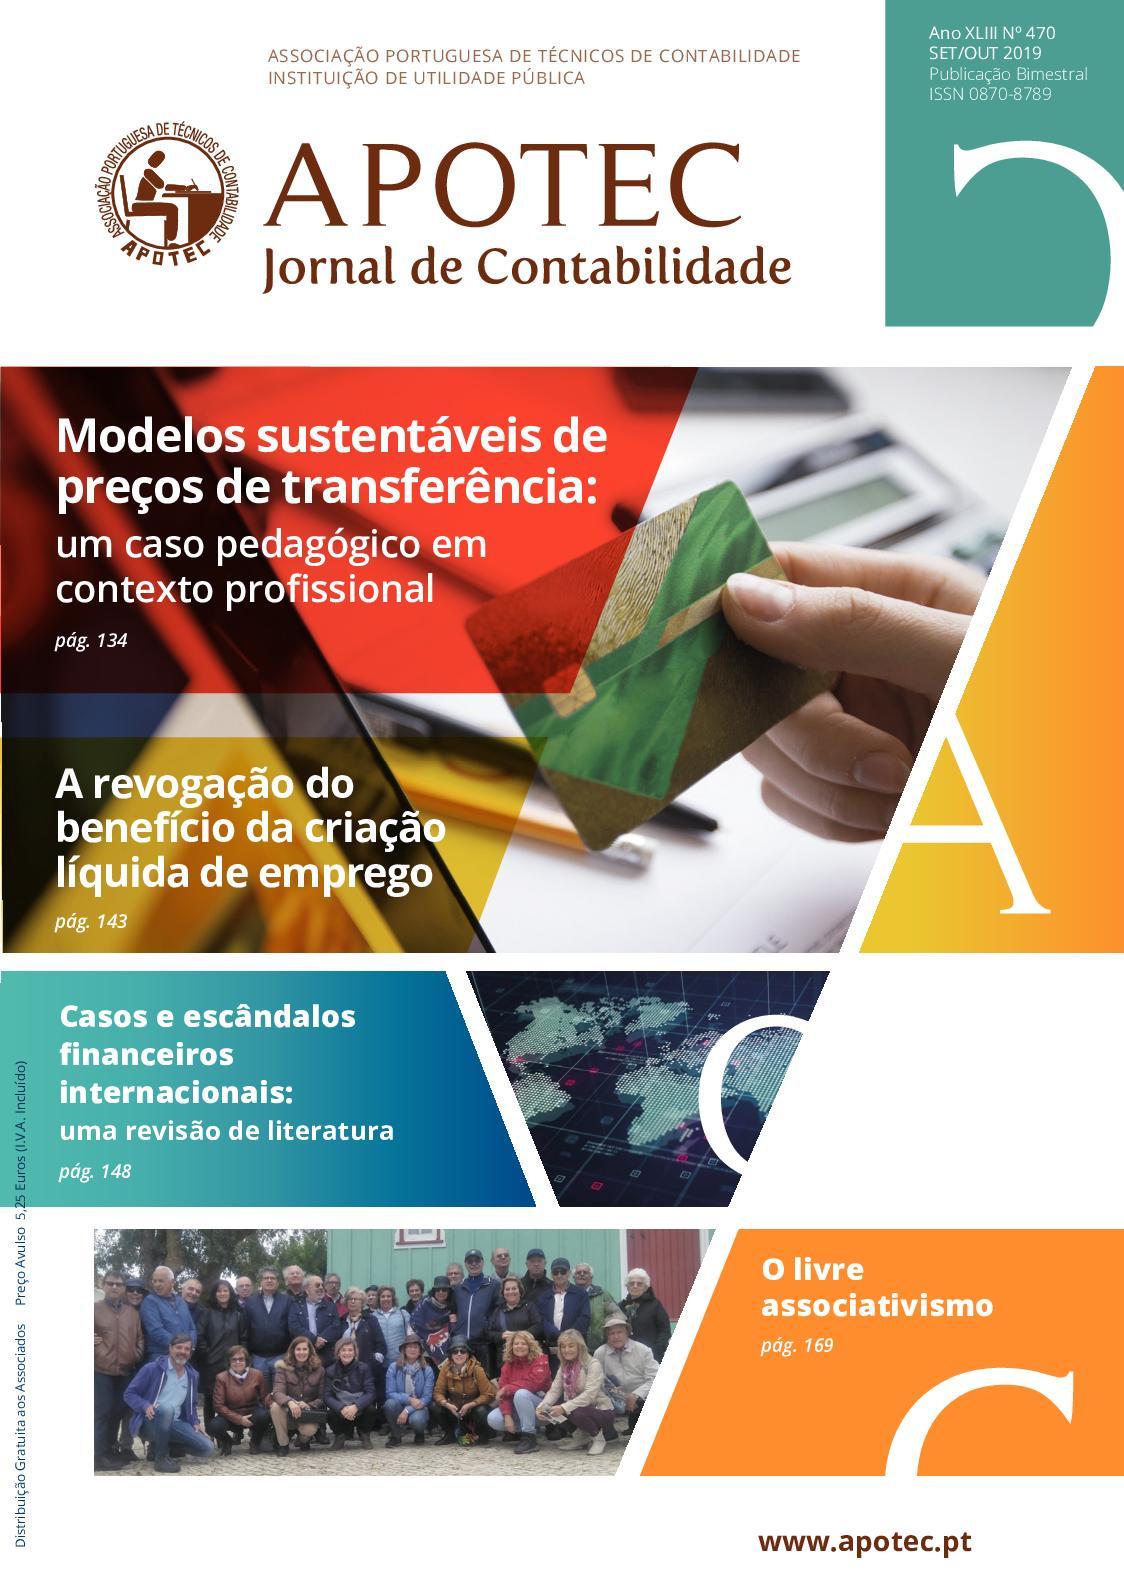 Jornal Contabilidade nº 470